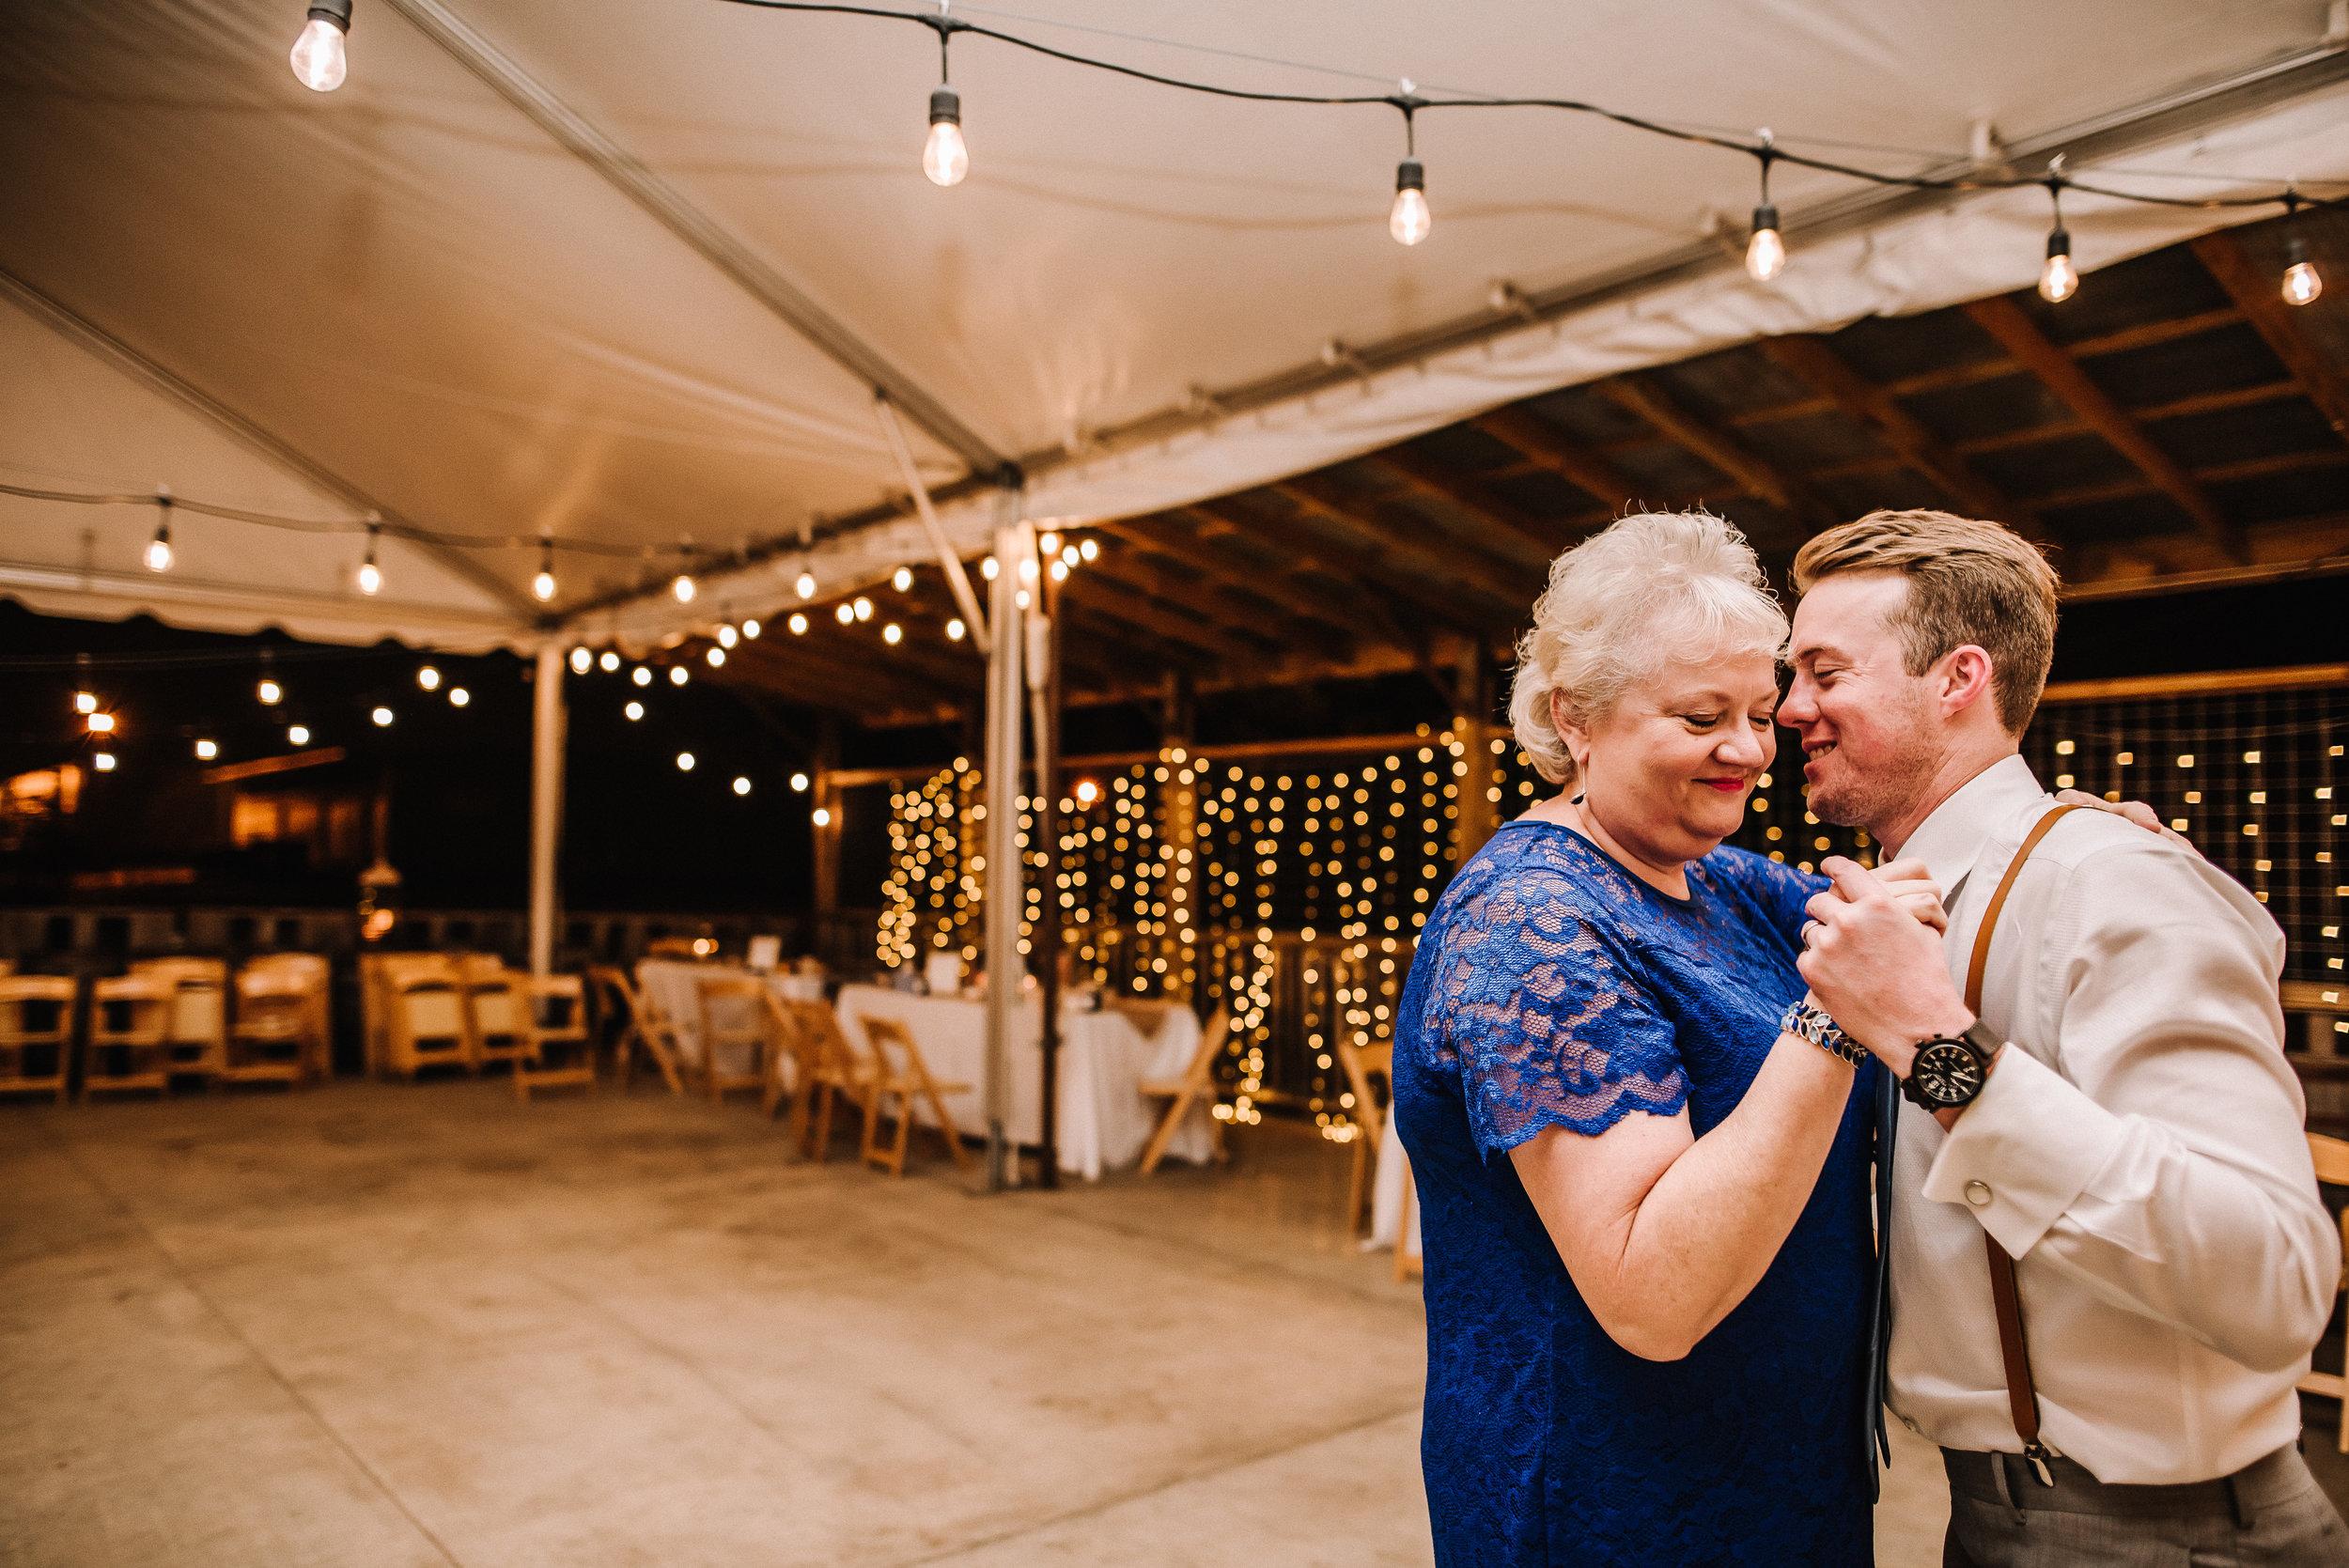 Pearson-Wiseacre-Wedding_Ashley-Benham-Photography (430 of 633).jpg